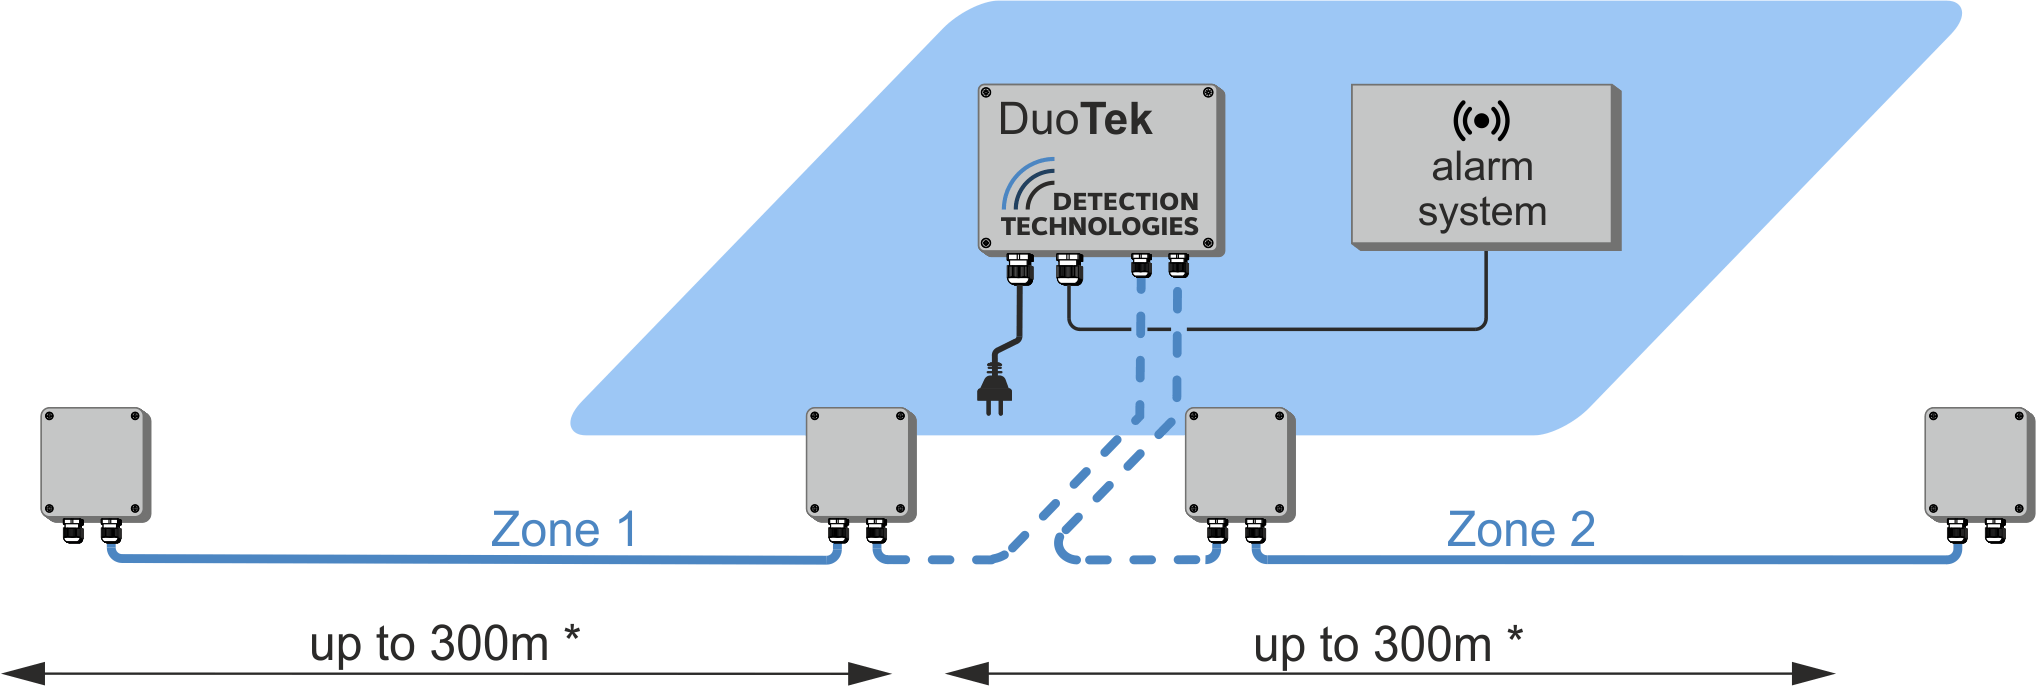 DuoTek analyser line configuration